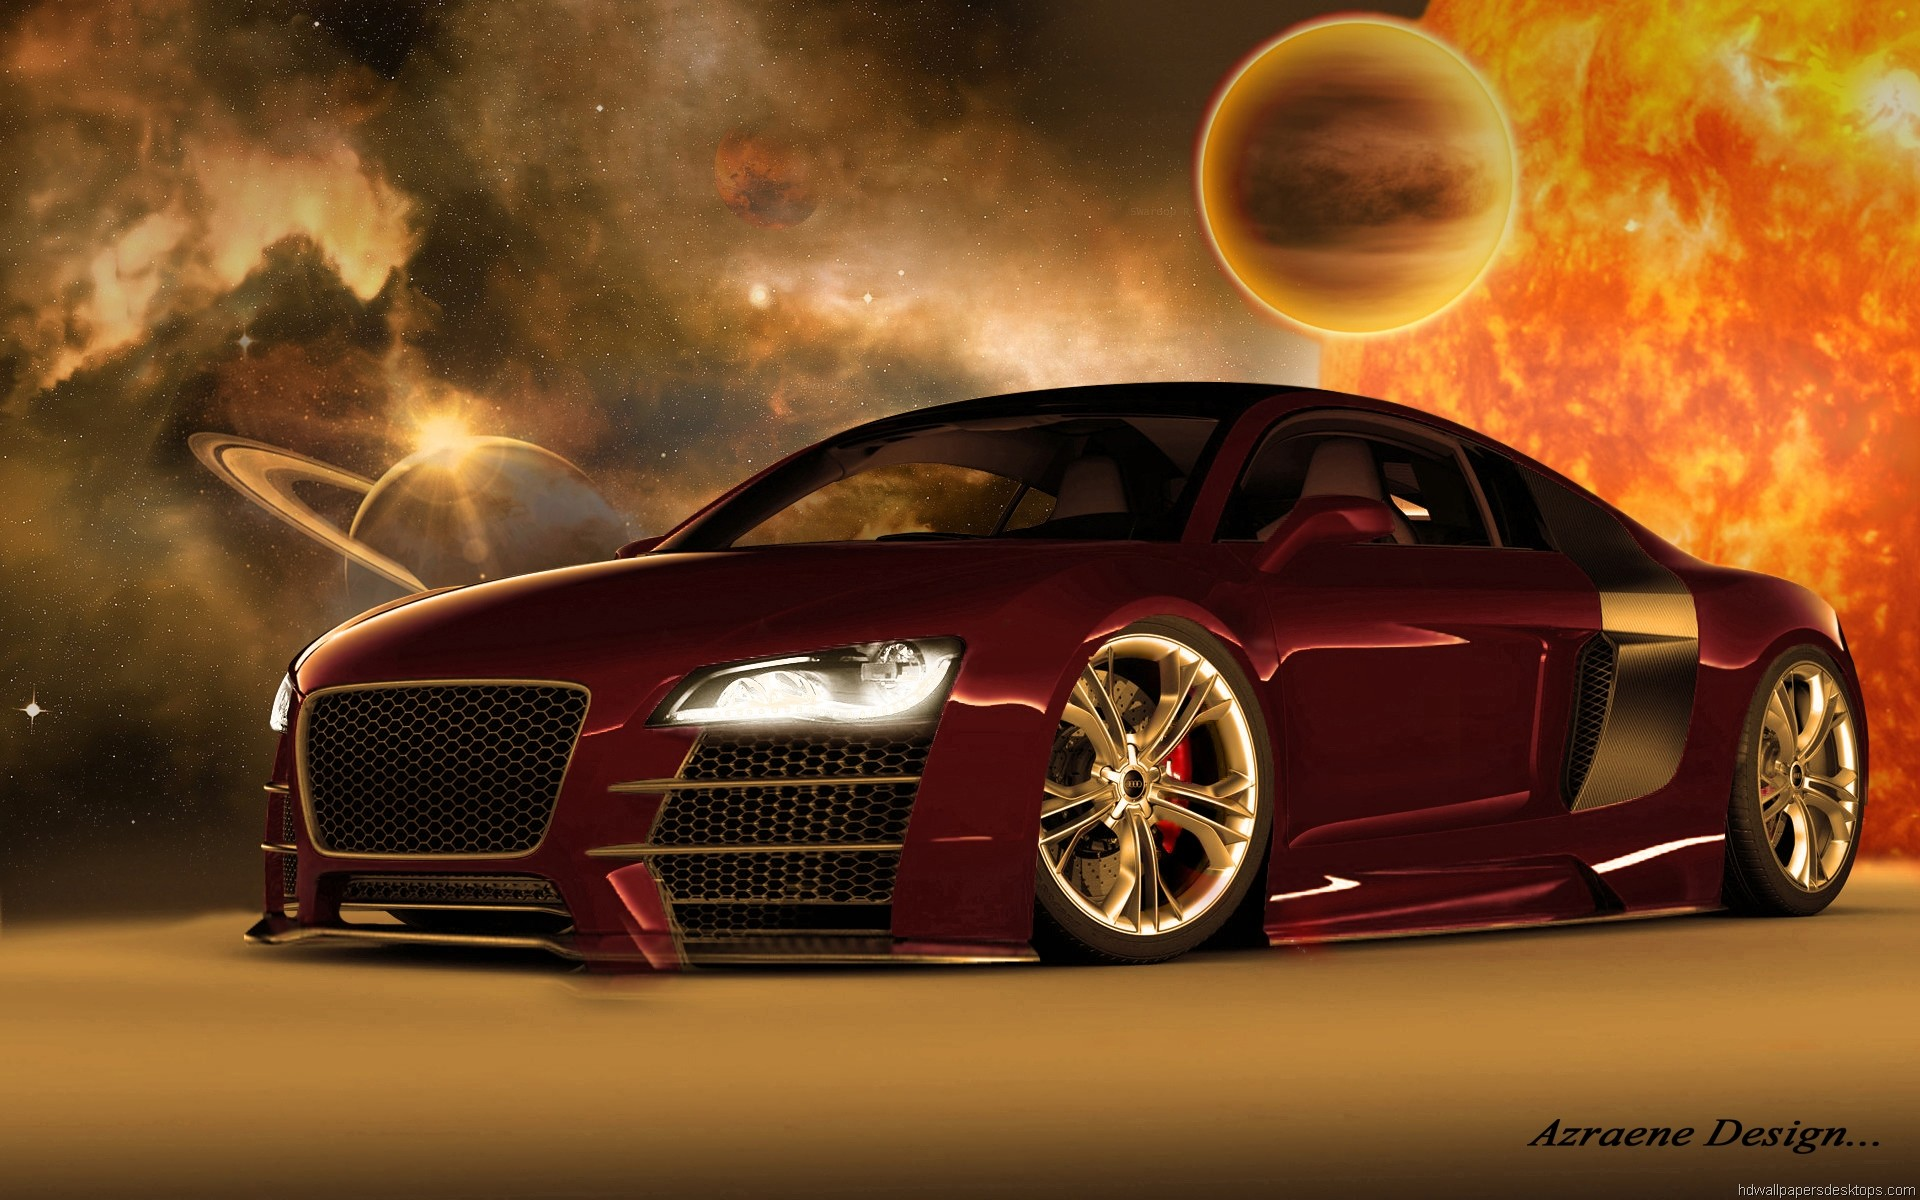 Hd 1080p Wallpaper 3d Car Image Gallery